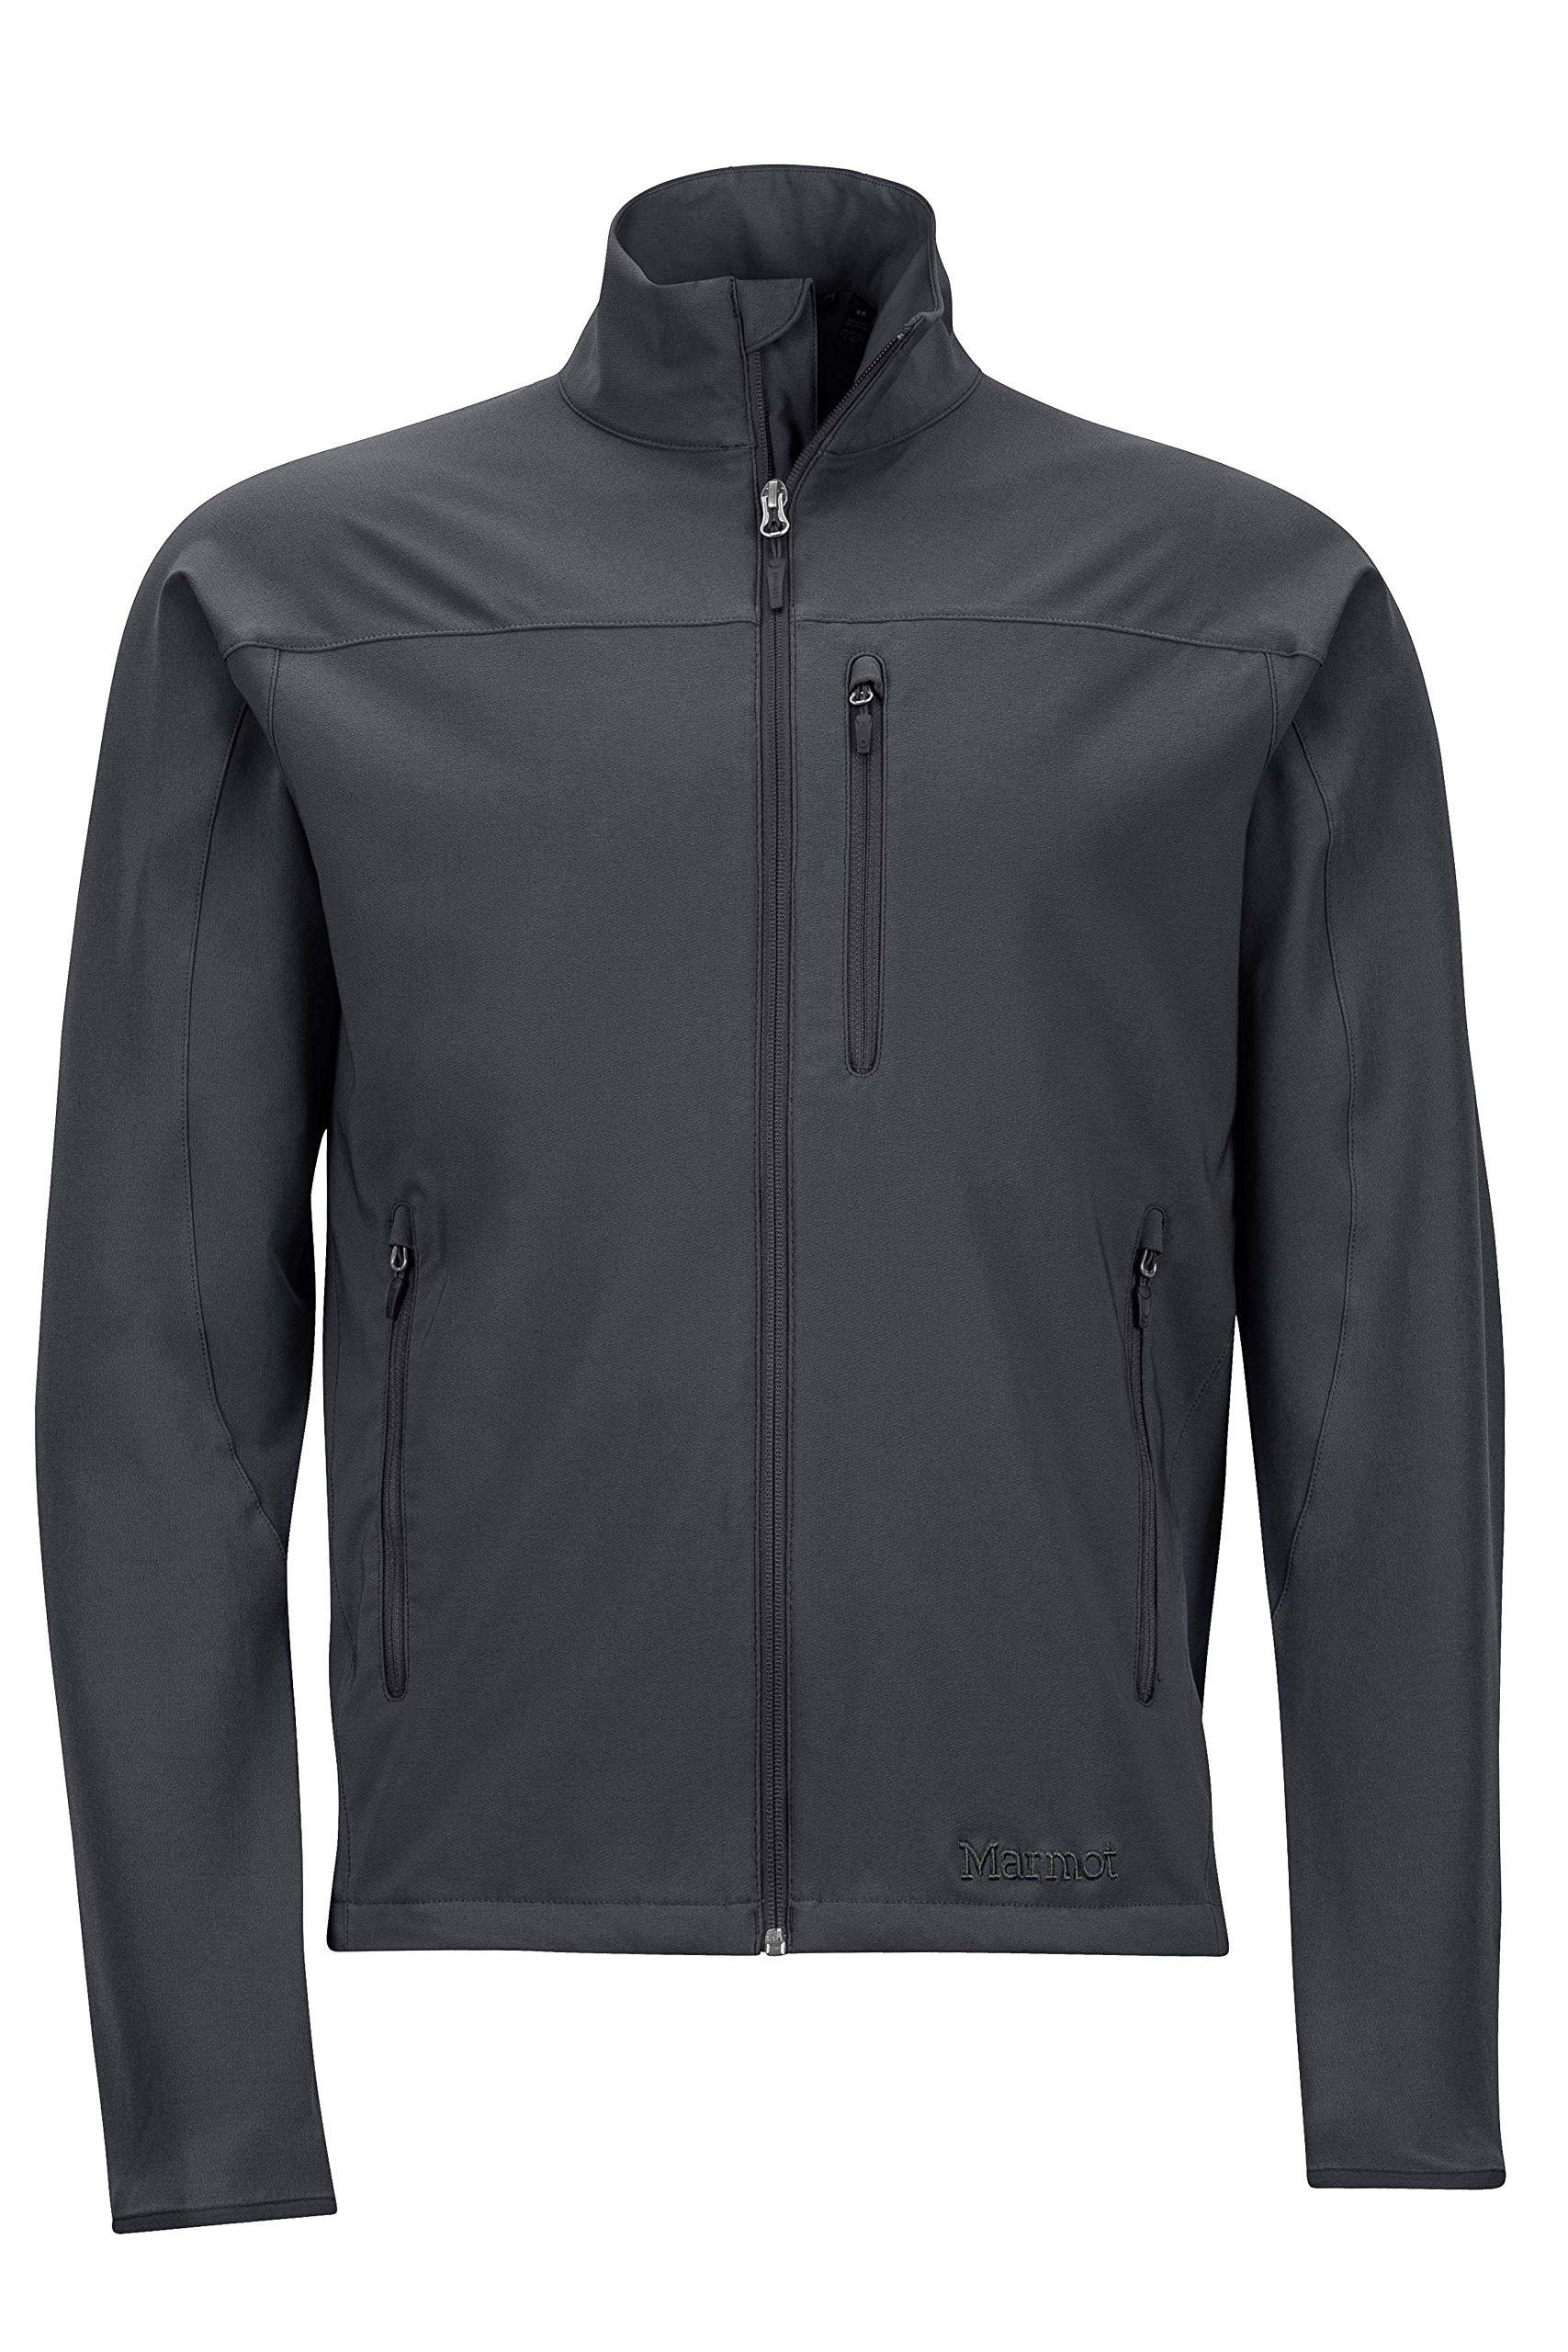 Marmot Tempo Men's Softshell Jacket, Jet Black, Medium by Marmot